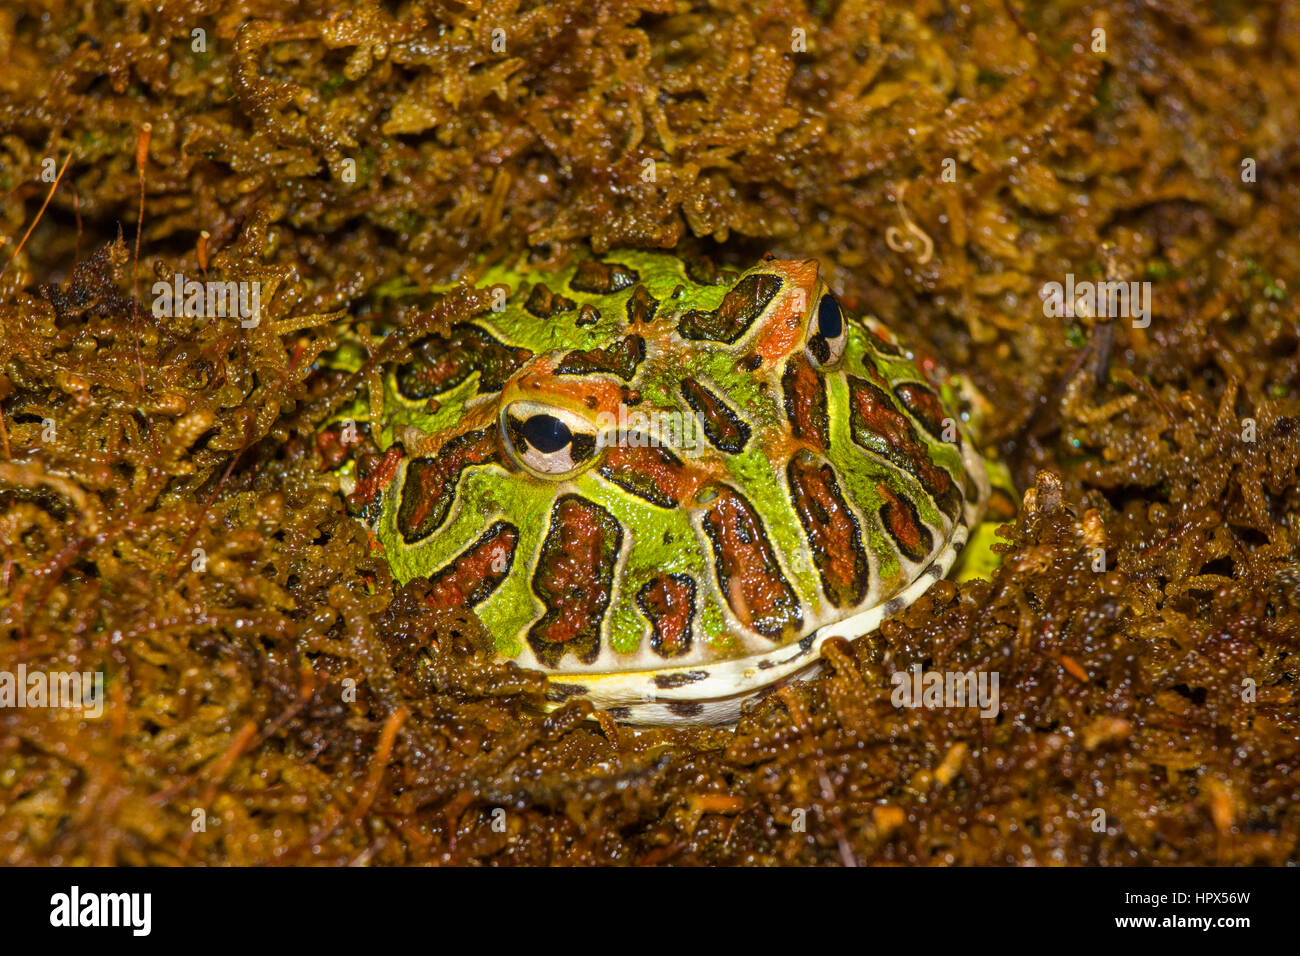 Closup of Ornate Horned Frog - Stock Image